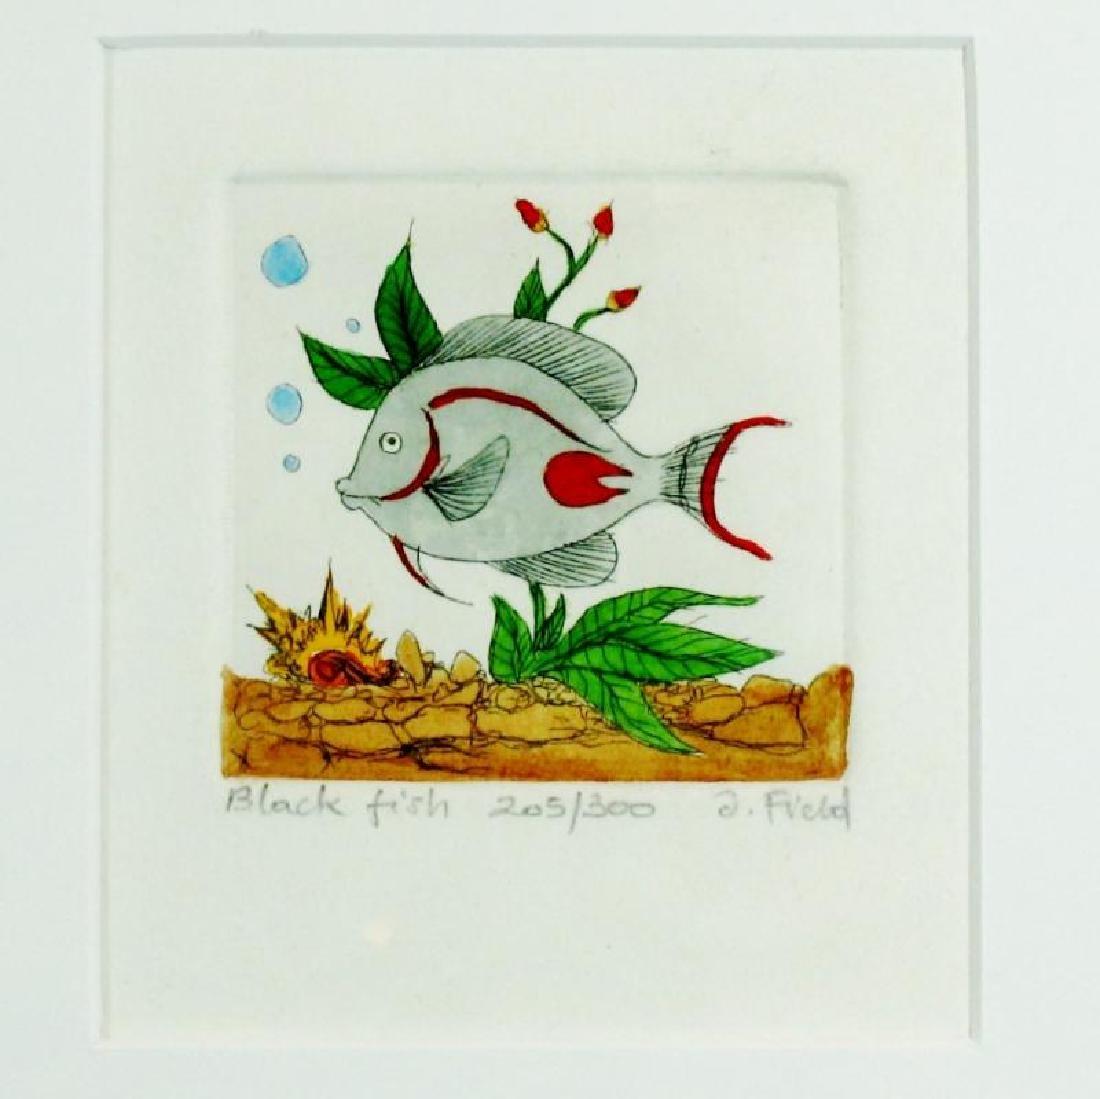 Black Fish Signed Etching Ltd Ed Dealer Liquidation Art